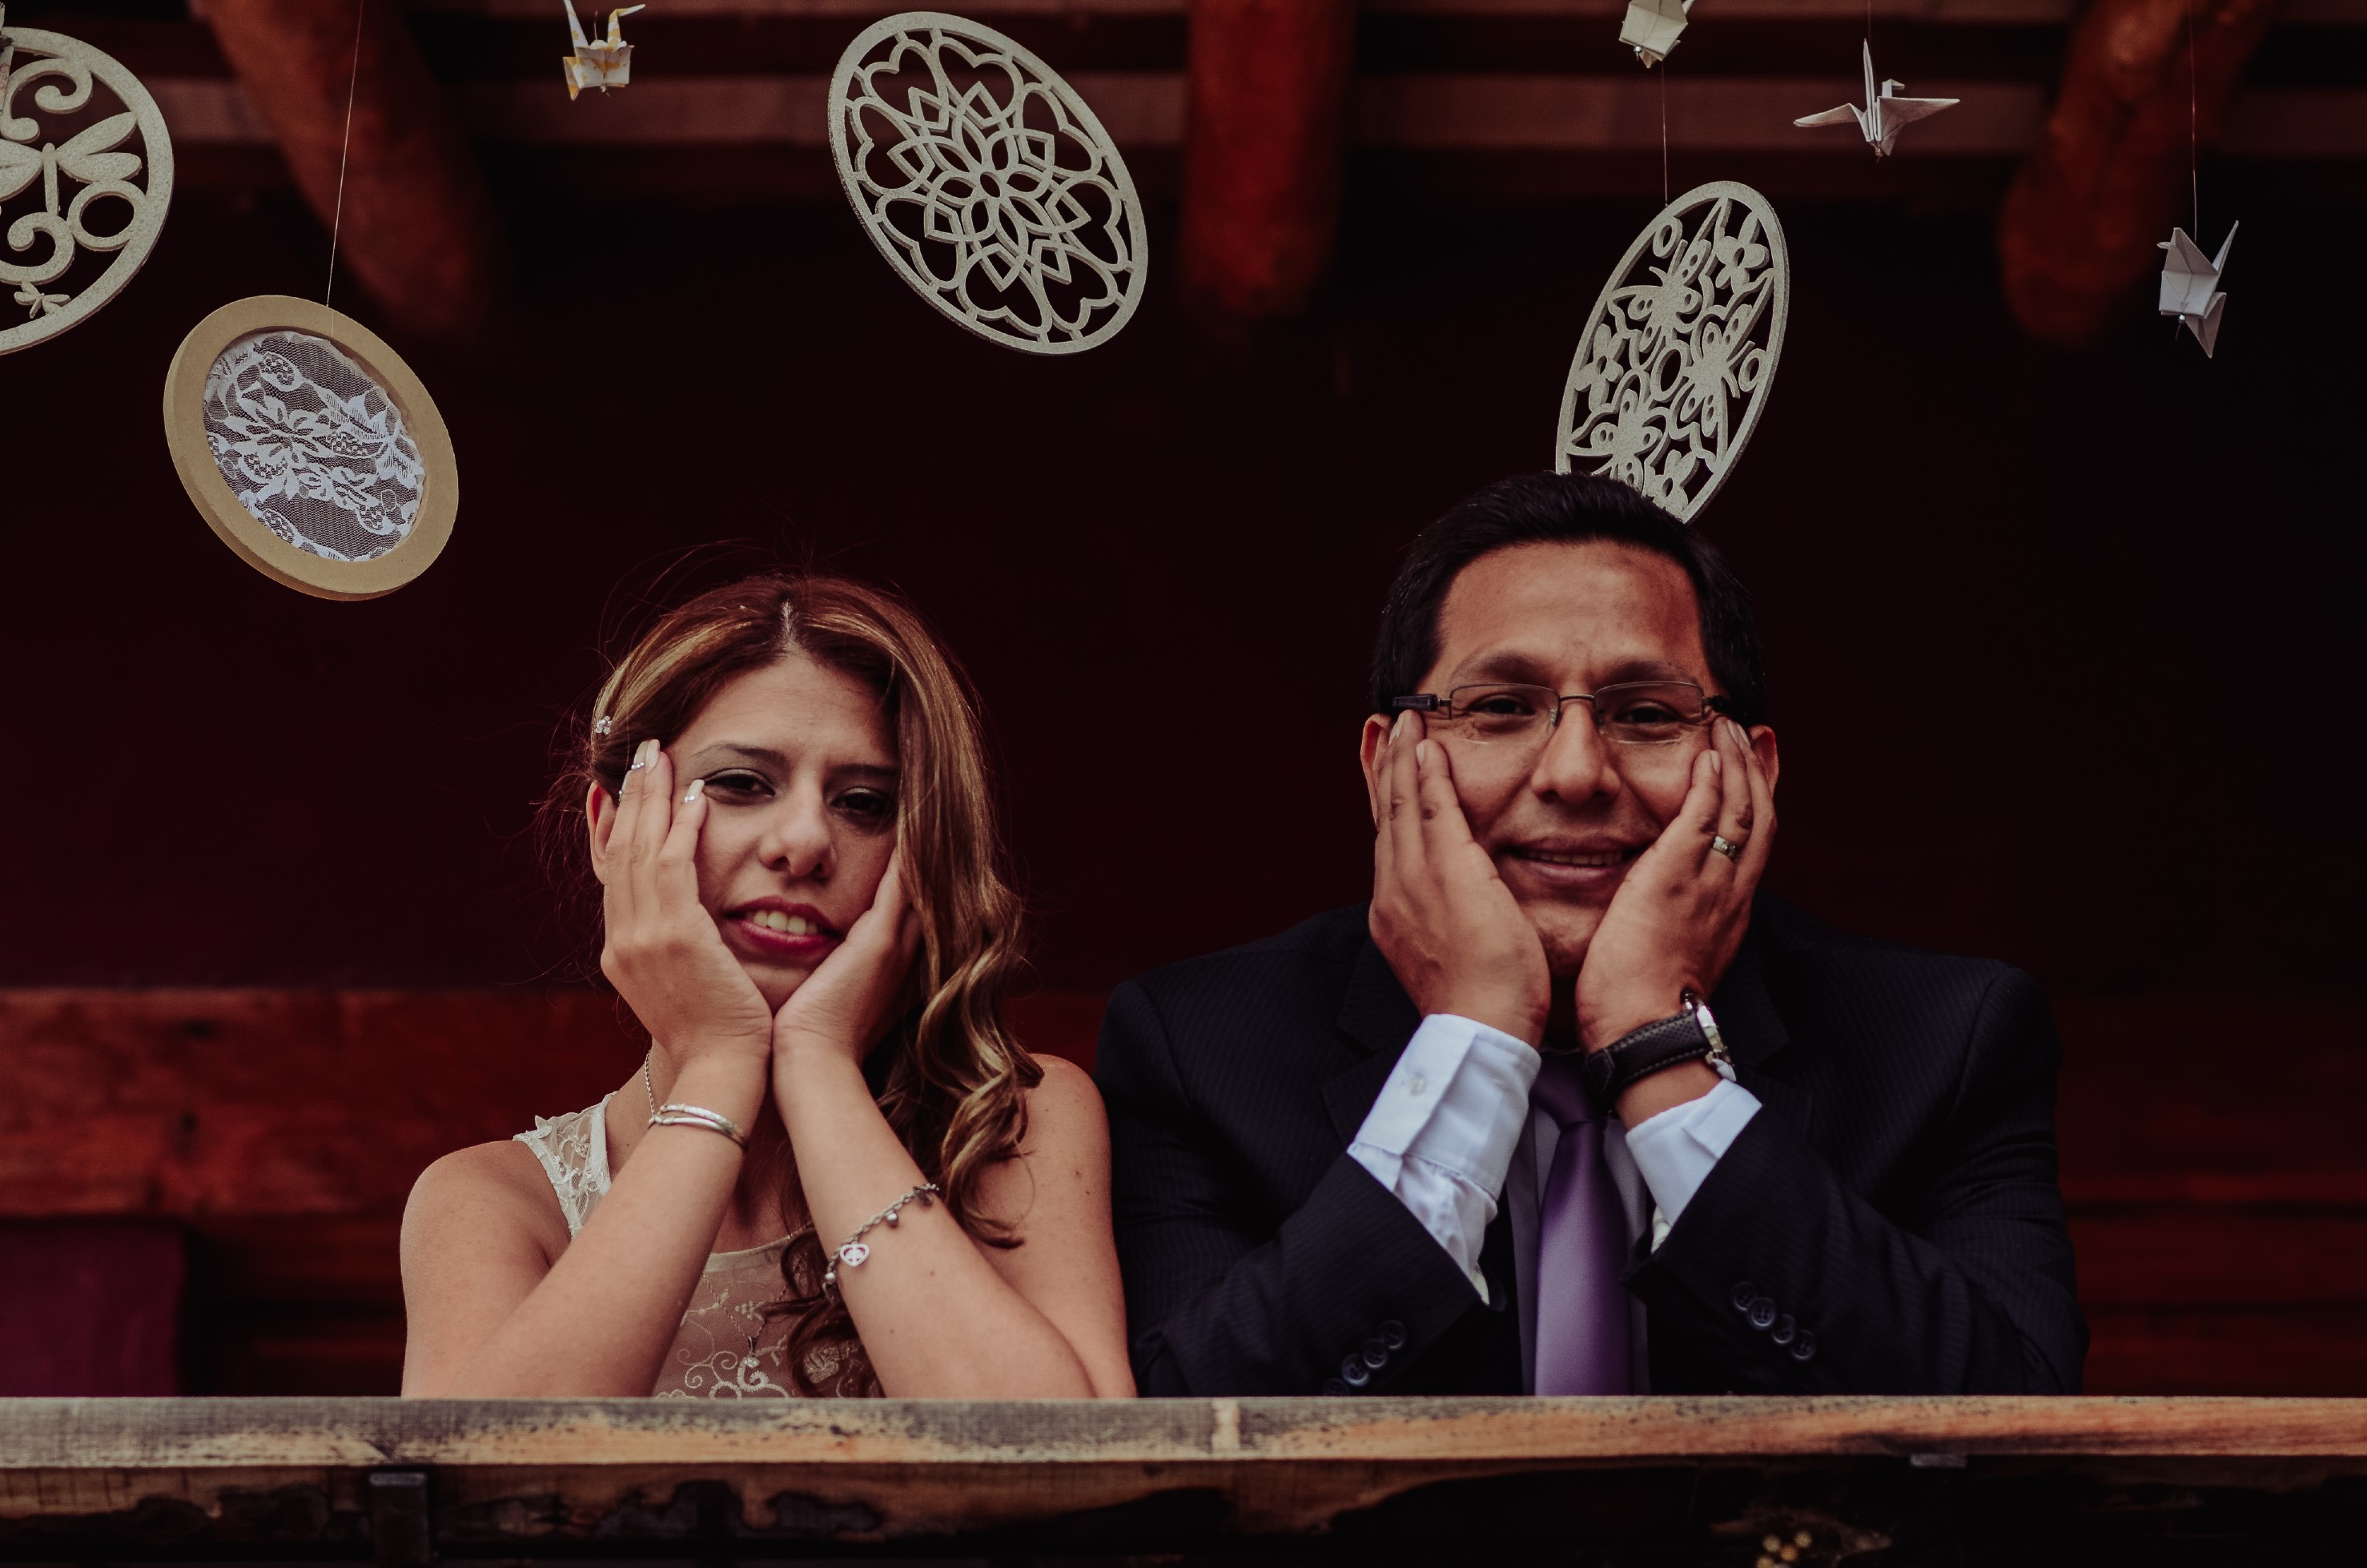 BODA_Karina & Lucas_Cabra Corral_ Salta_MdB_ (34)